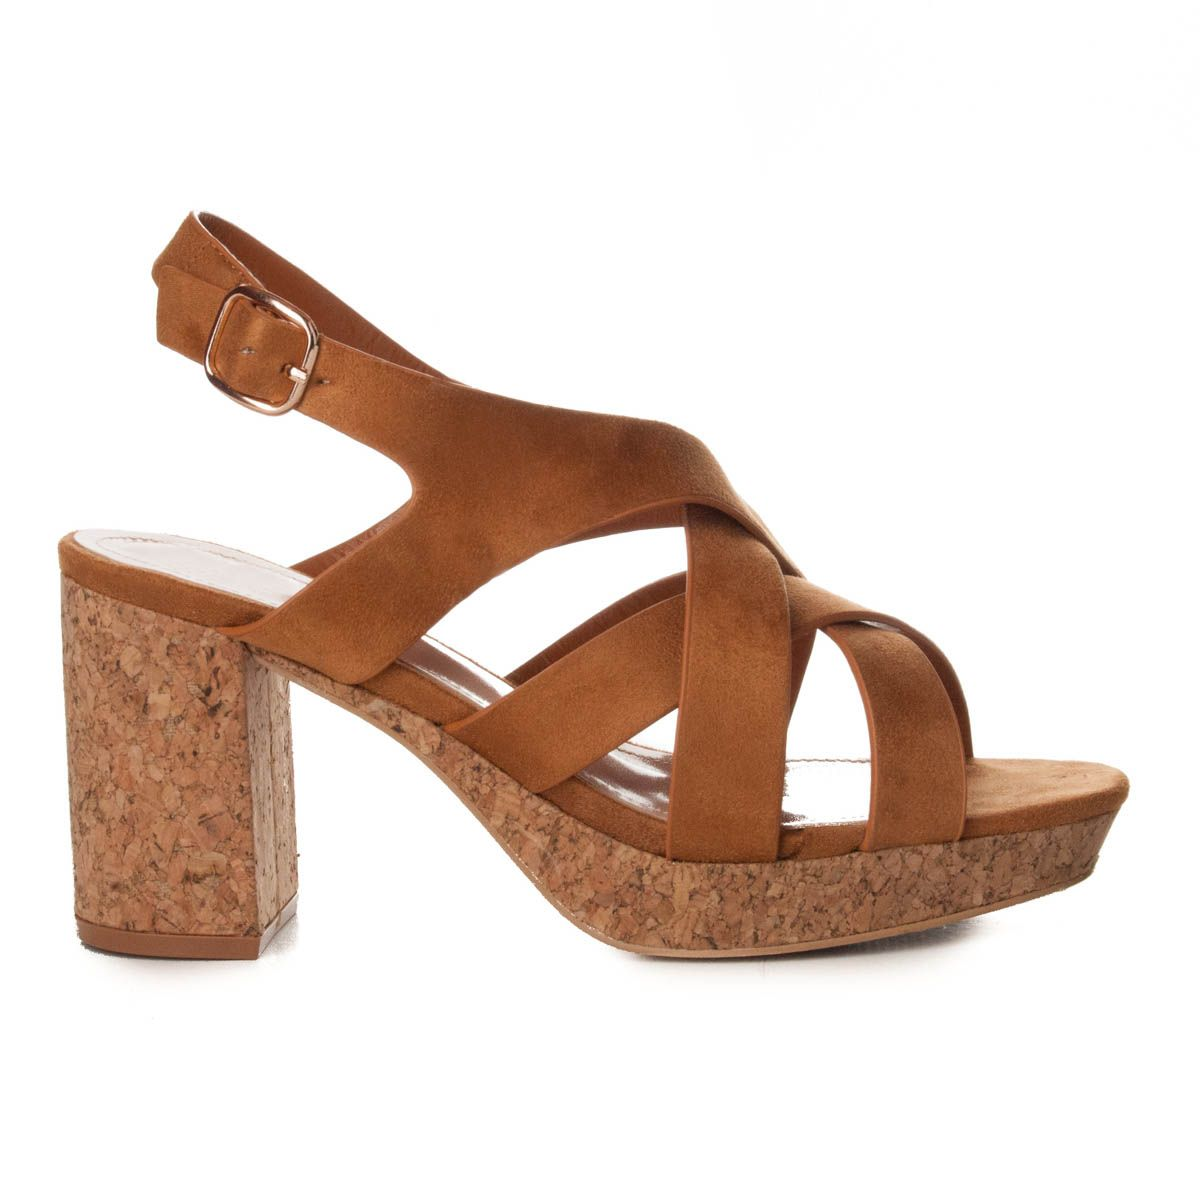 Montevita Platform Sandal in Camel